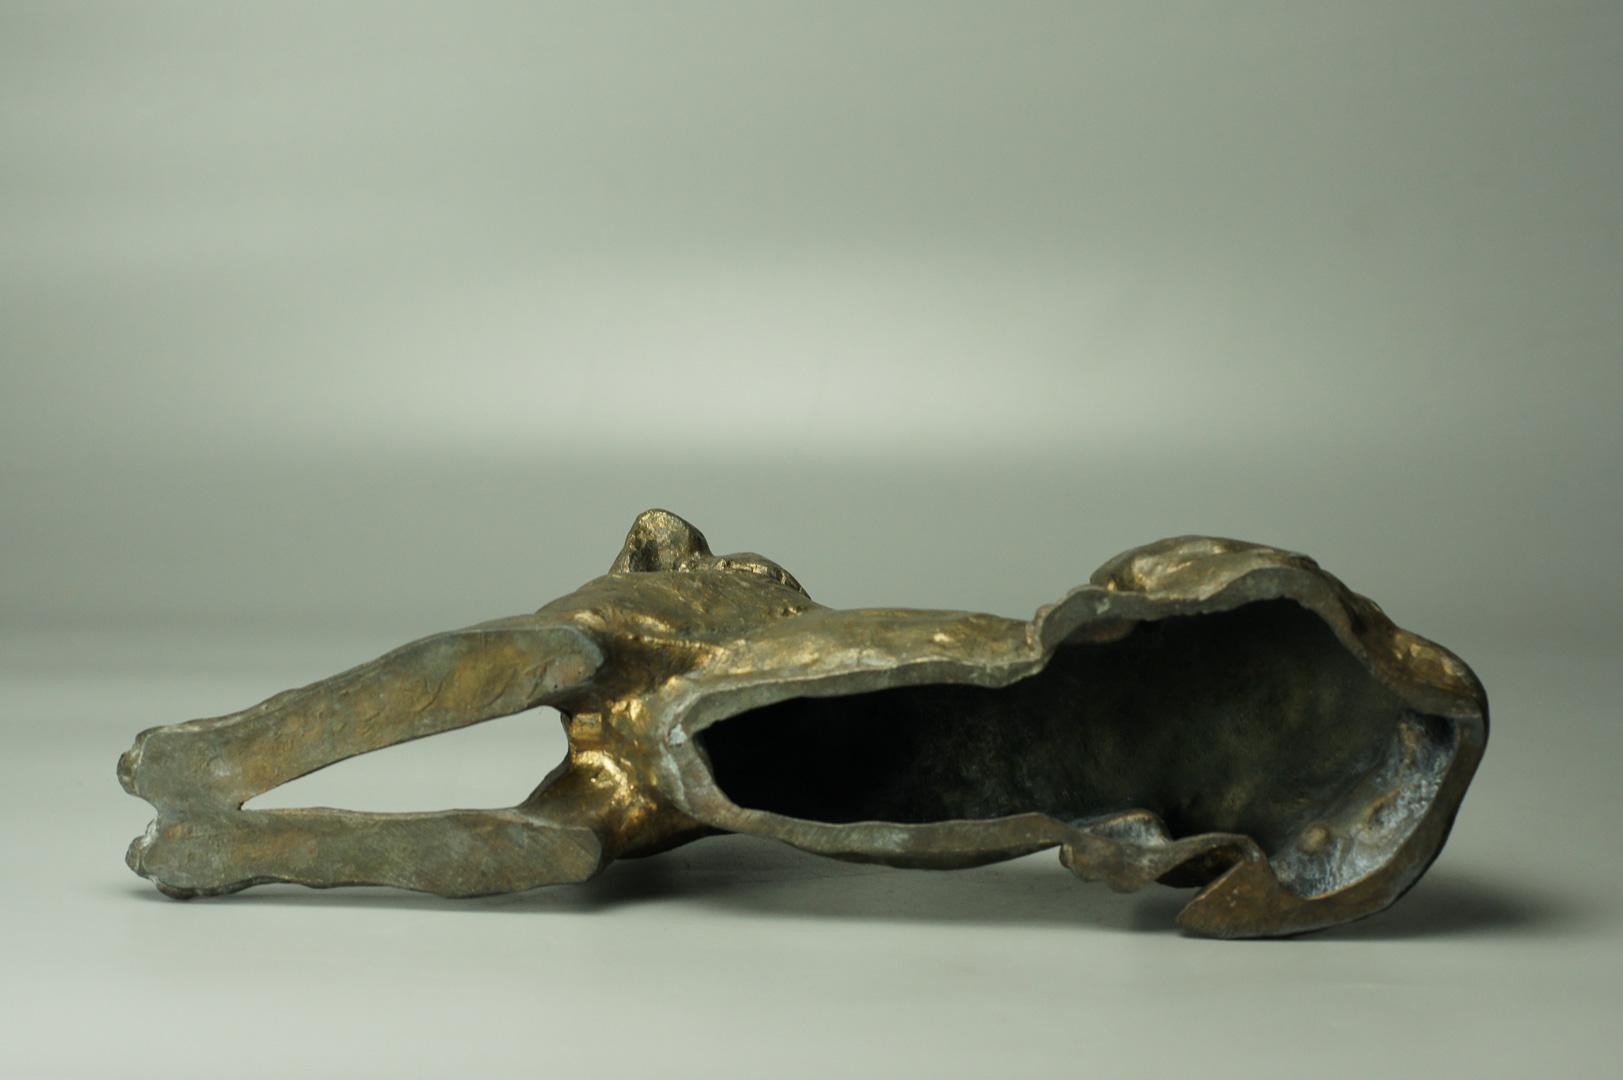 Статуэтка Охотничья собака пес силумин